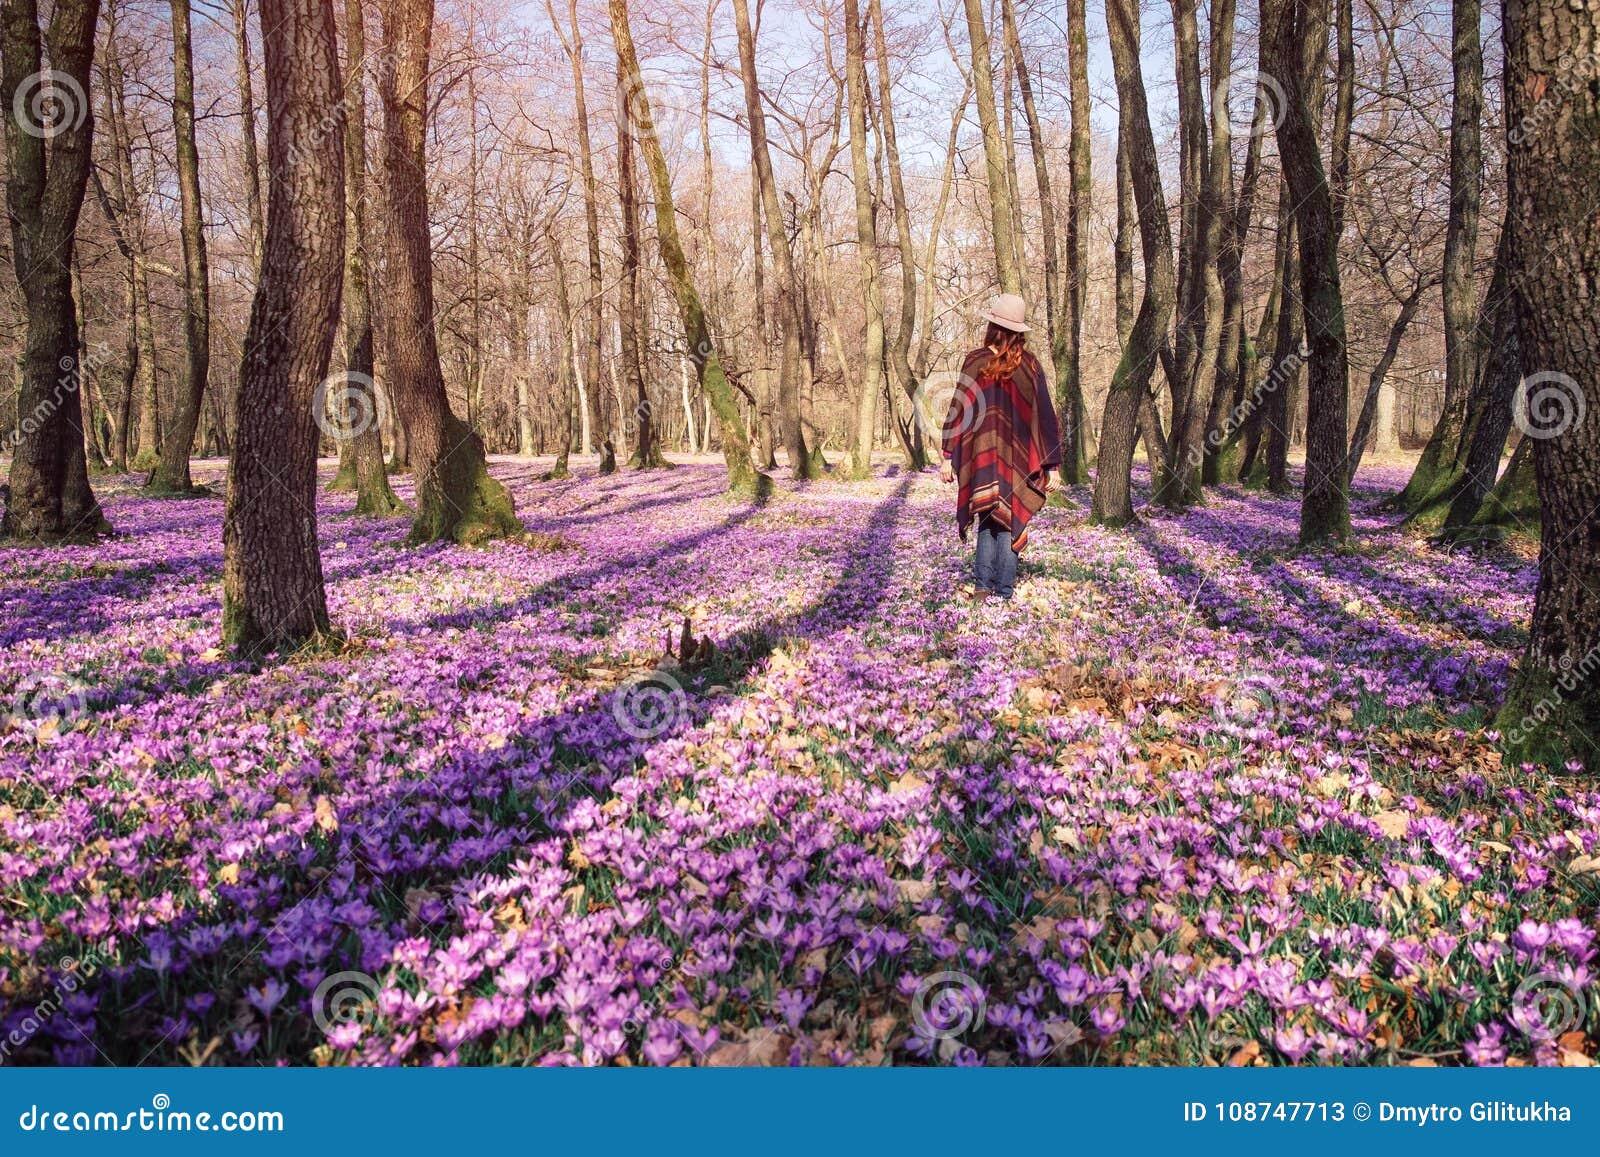 Kwitnąca natura, krokusy, młody podróżnik